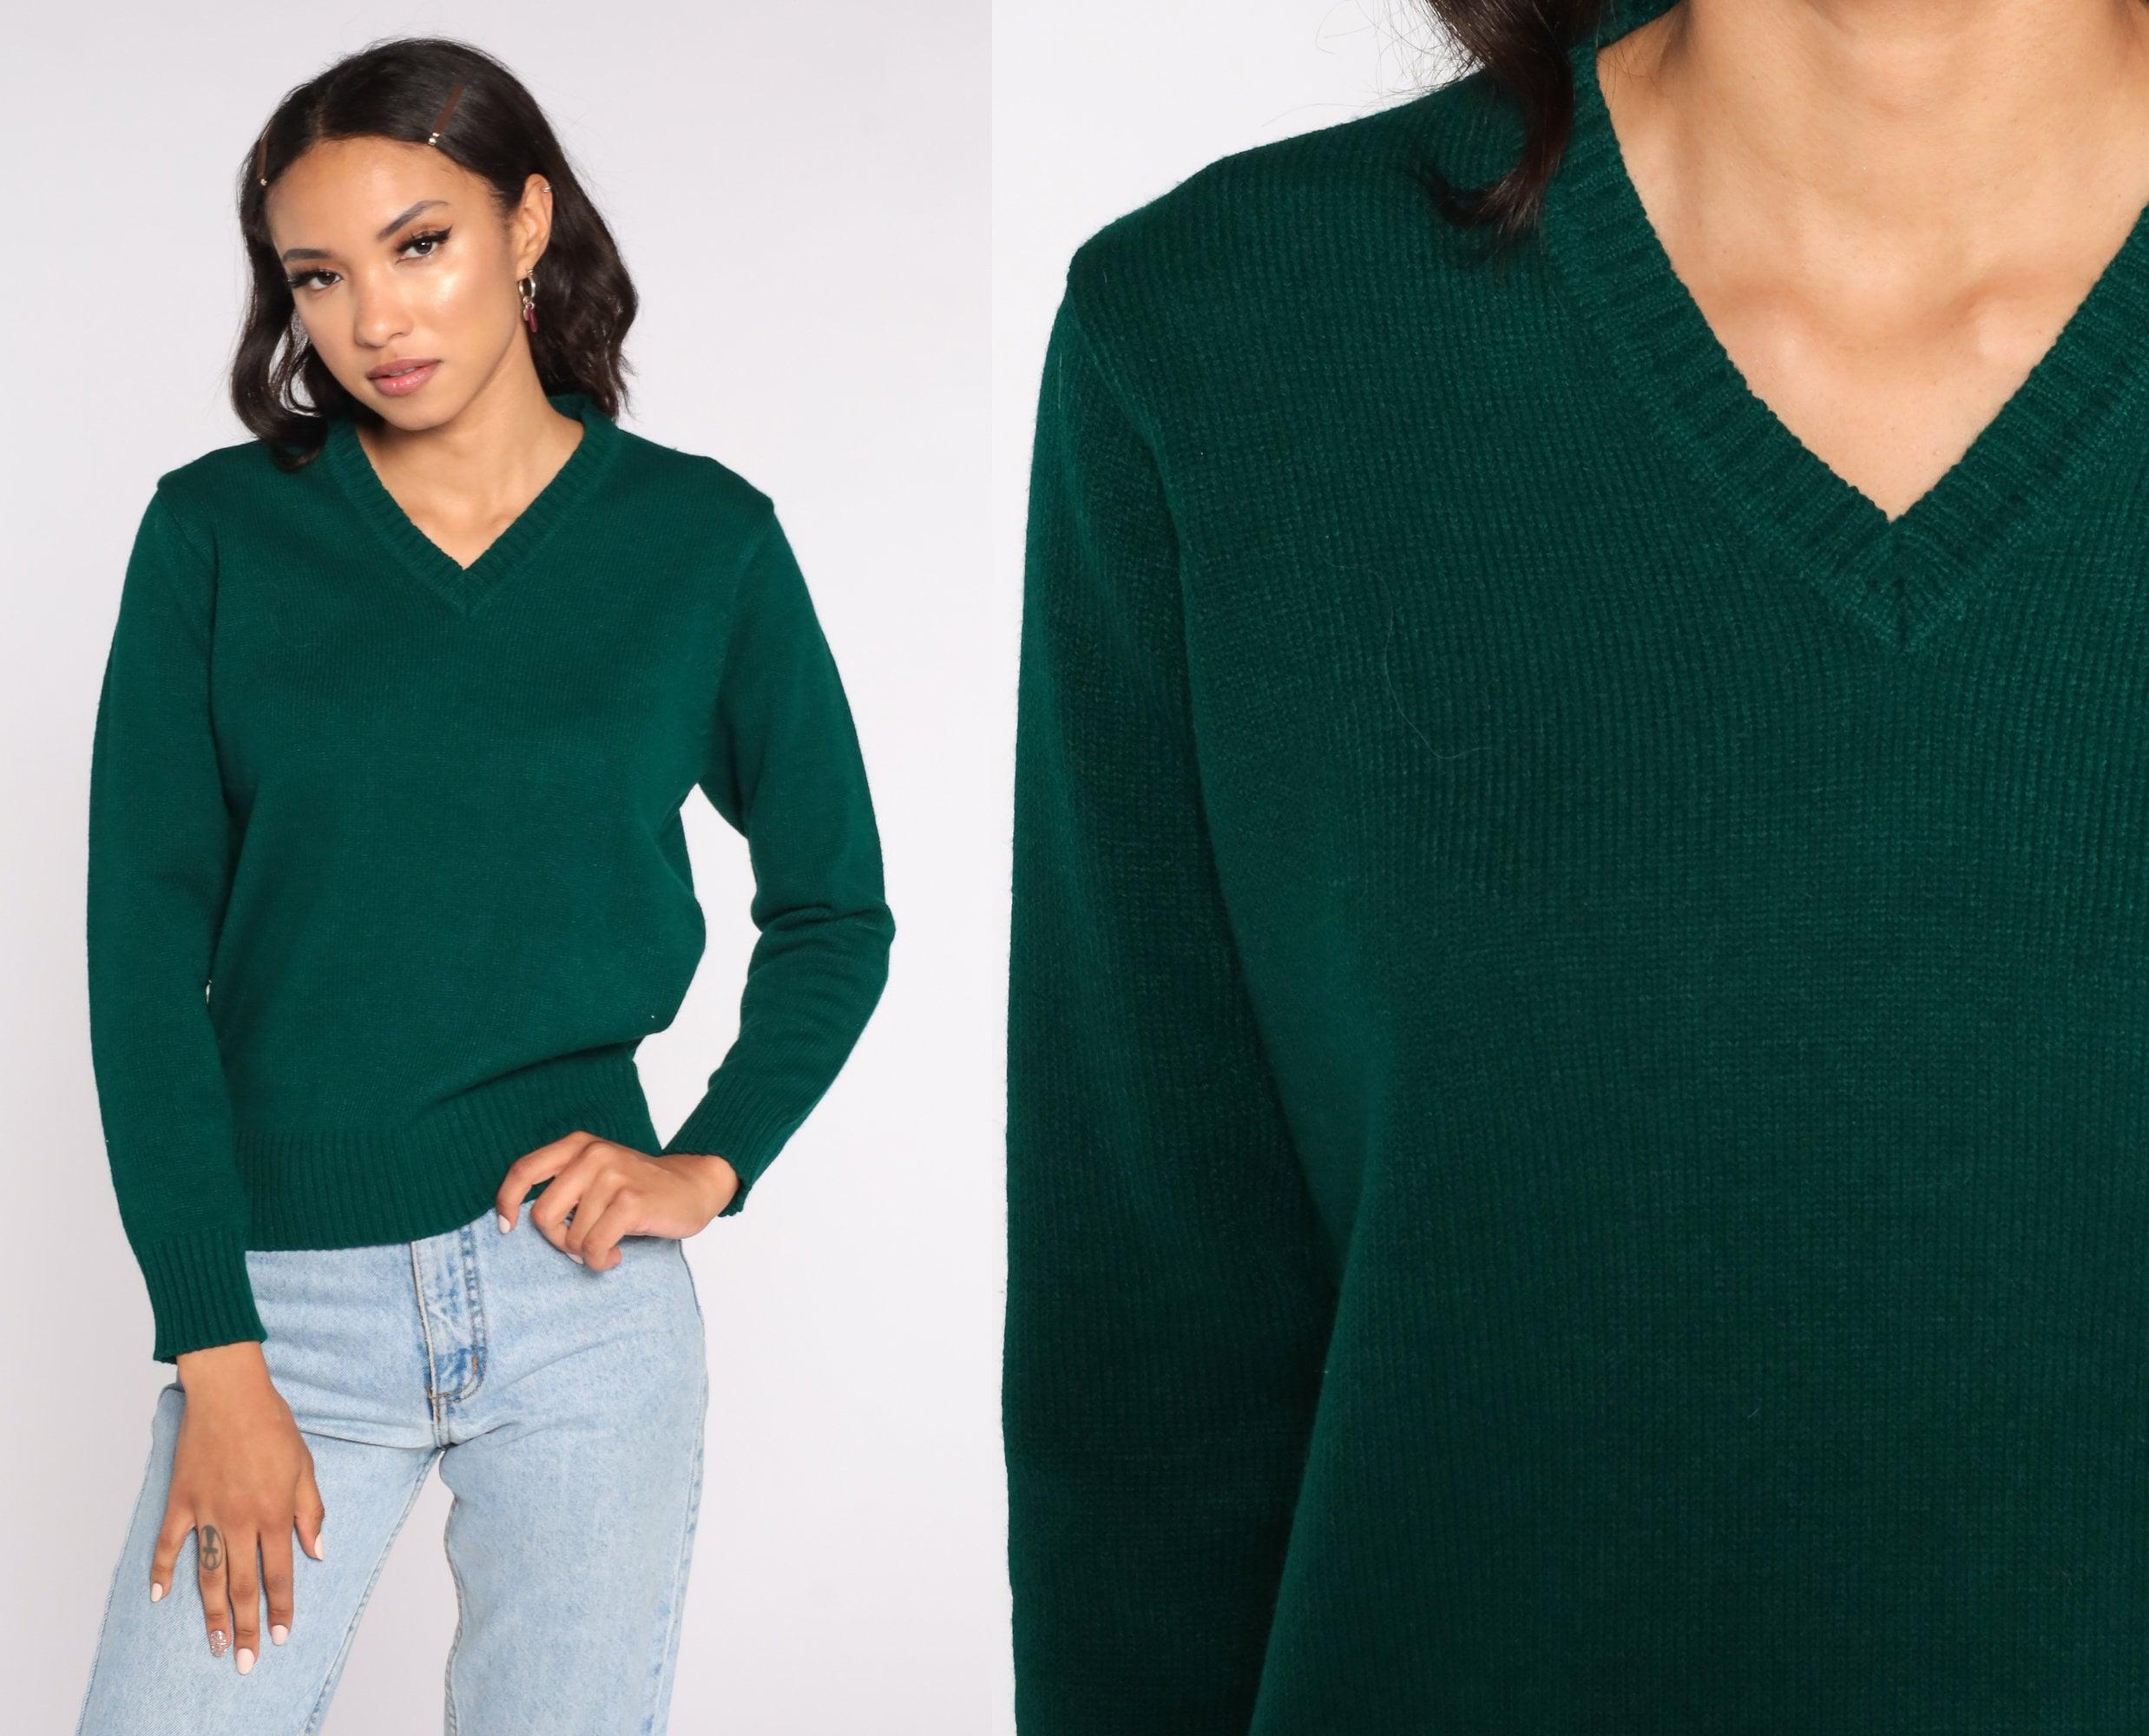 80s Sweatshirts, Sweaters, Vests | Women Green Sweater V Neck Slouchy 80S Grunge Hipster Plain Knit 1980S Vintage Normcore Retro Medium $39.00 AT vintagedancer.com